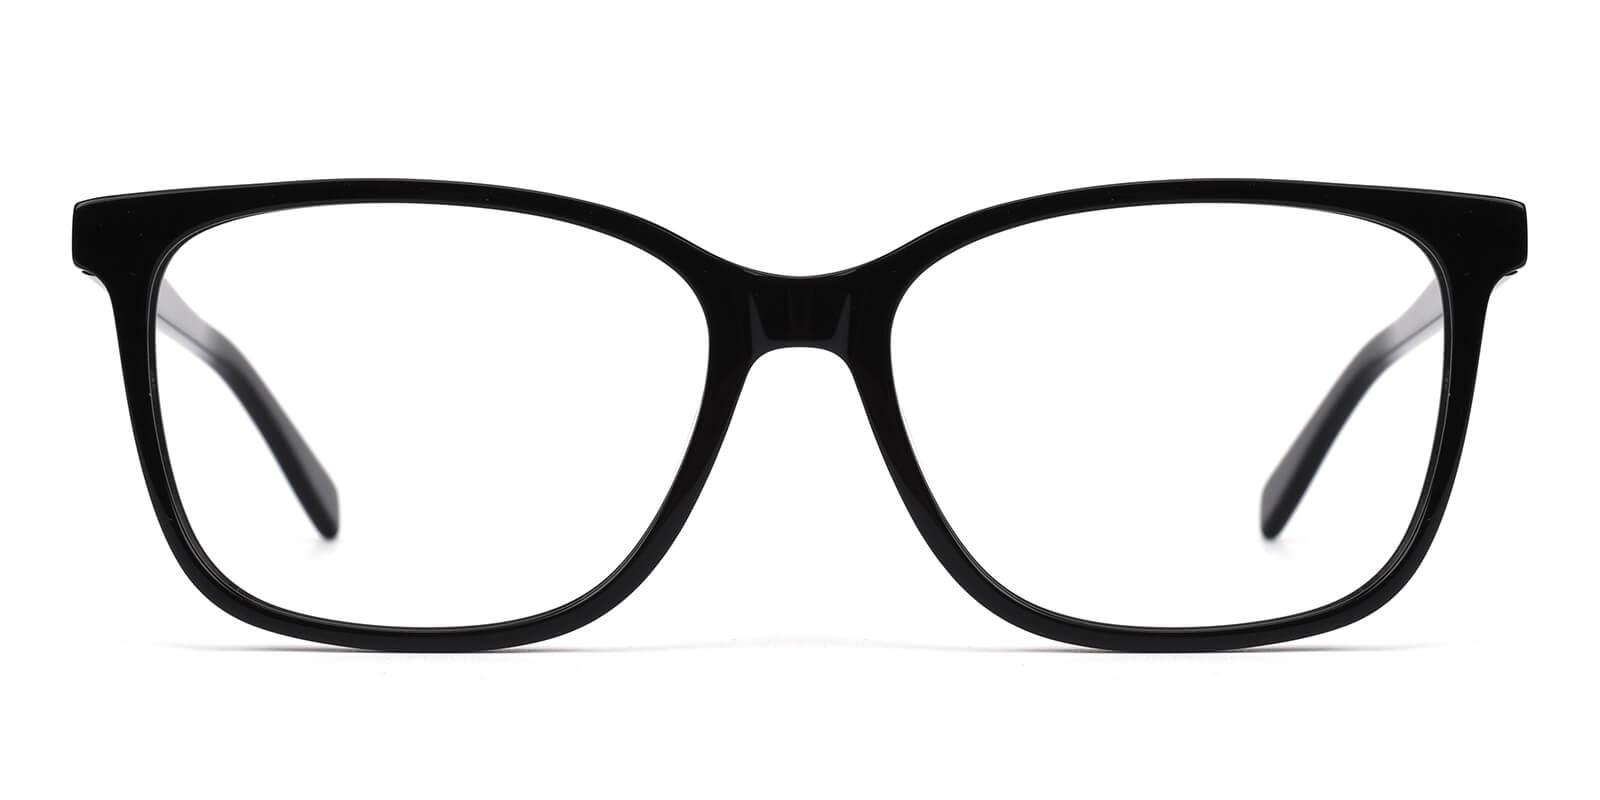 Defeny-Black-Square-Acetate-Eyeglasses-additional2